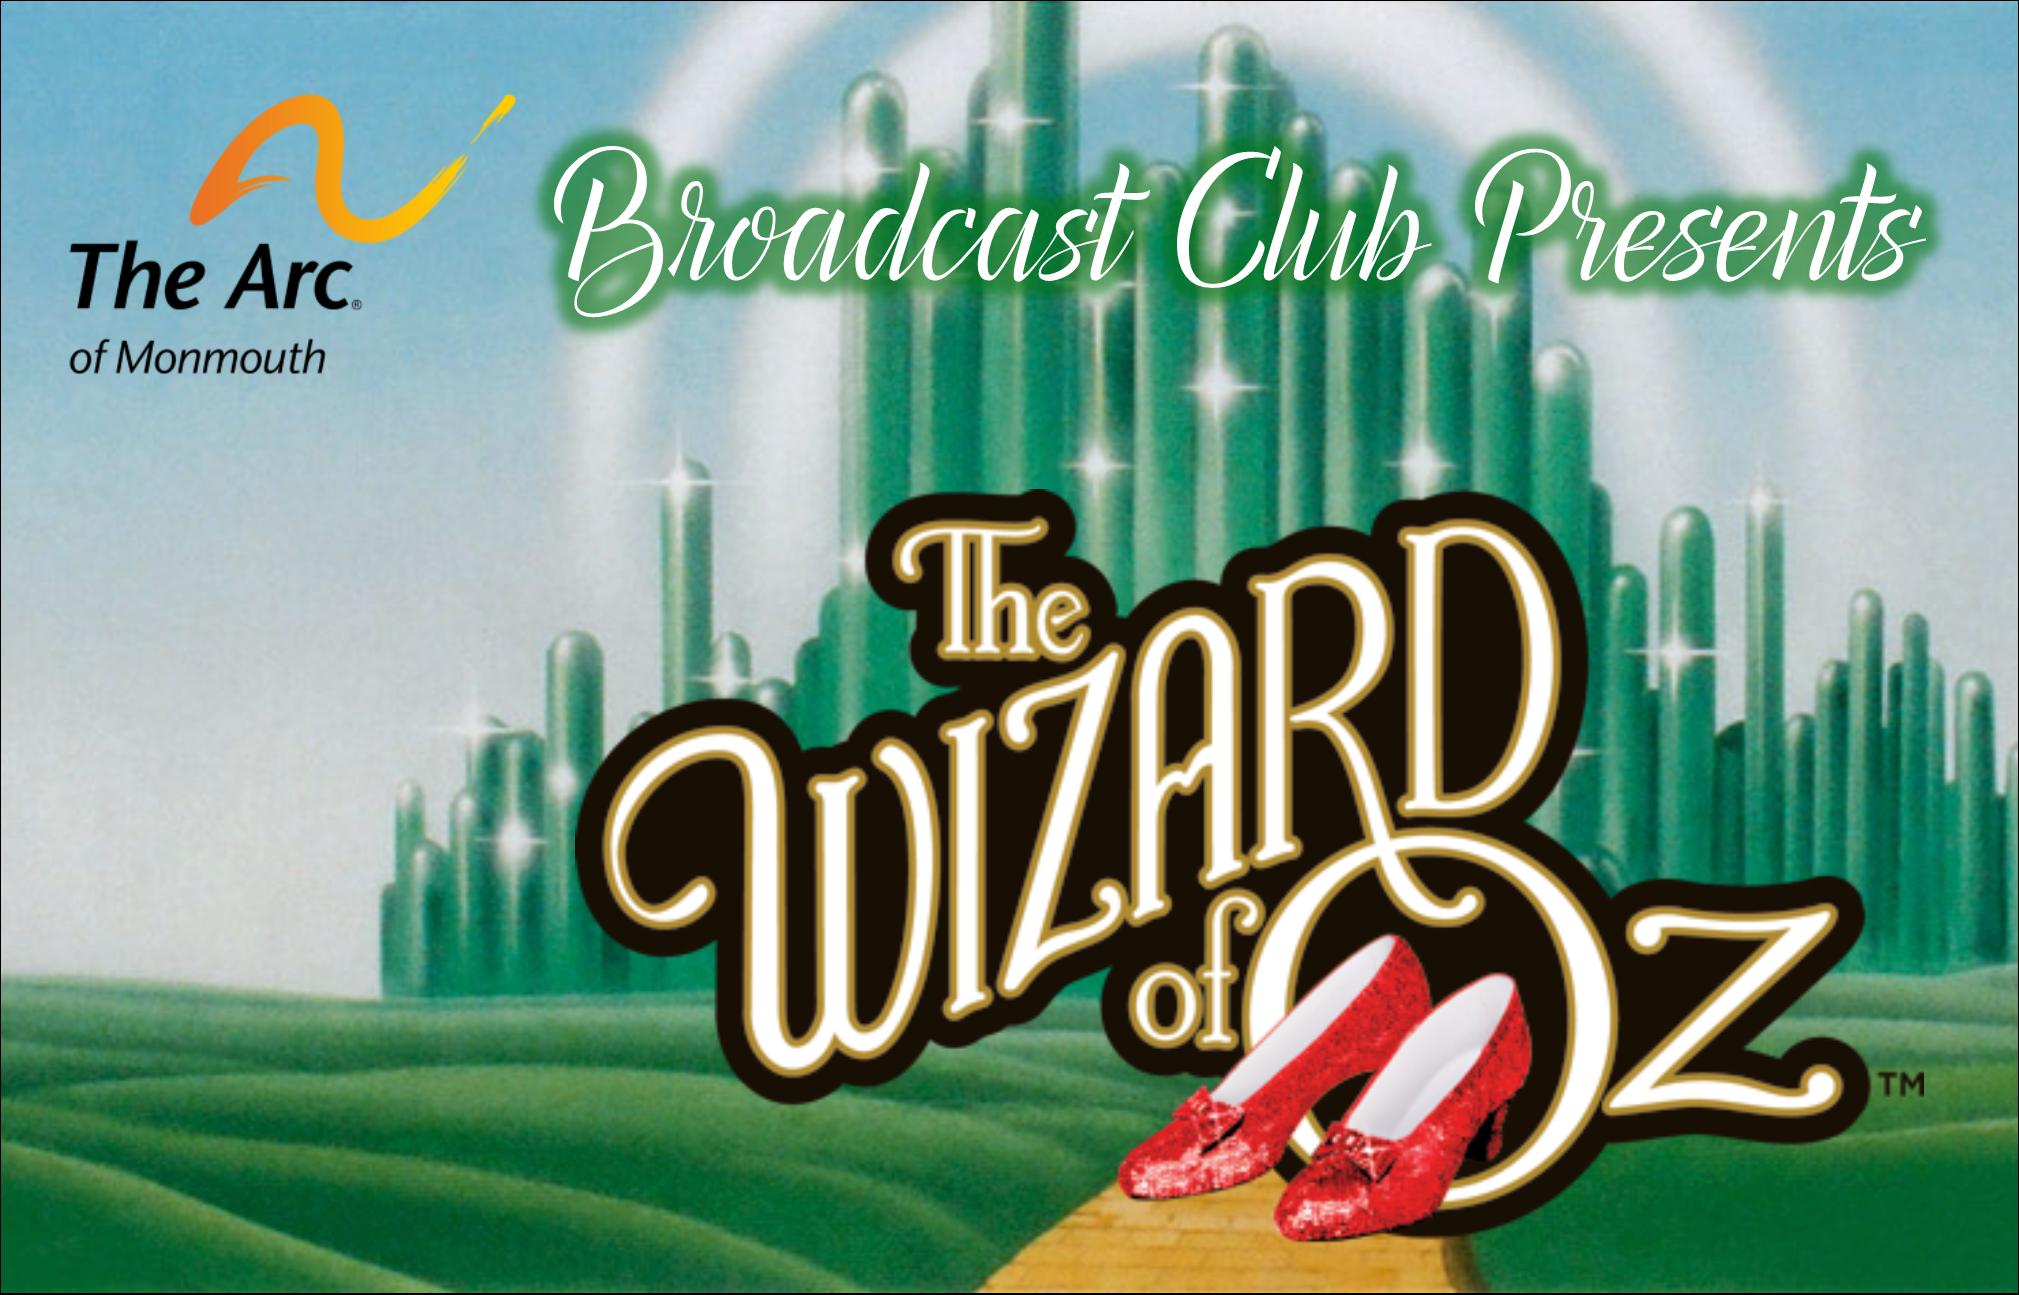 Wizard of Oz, April 21st